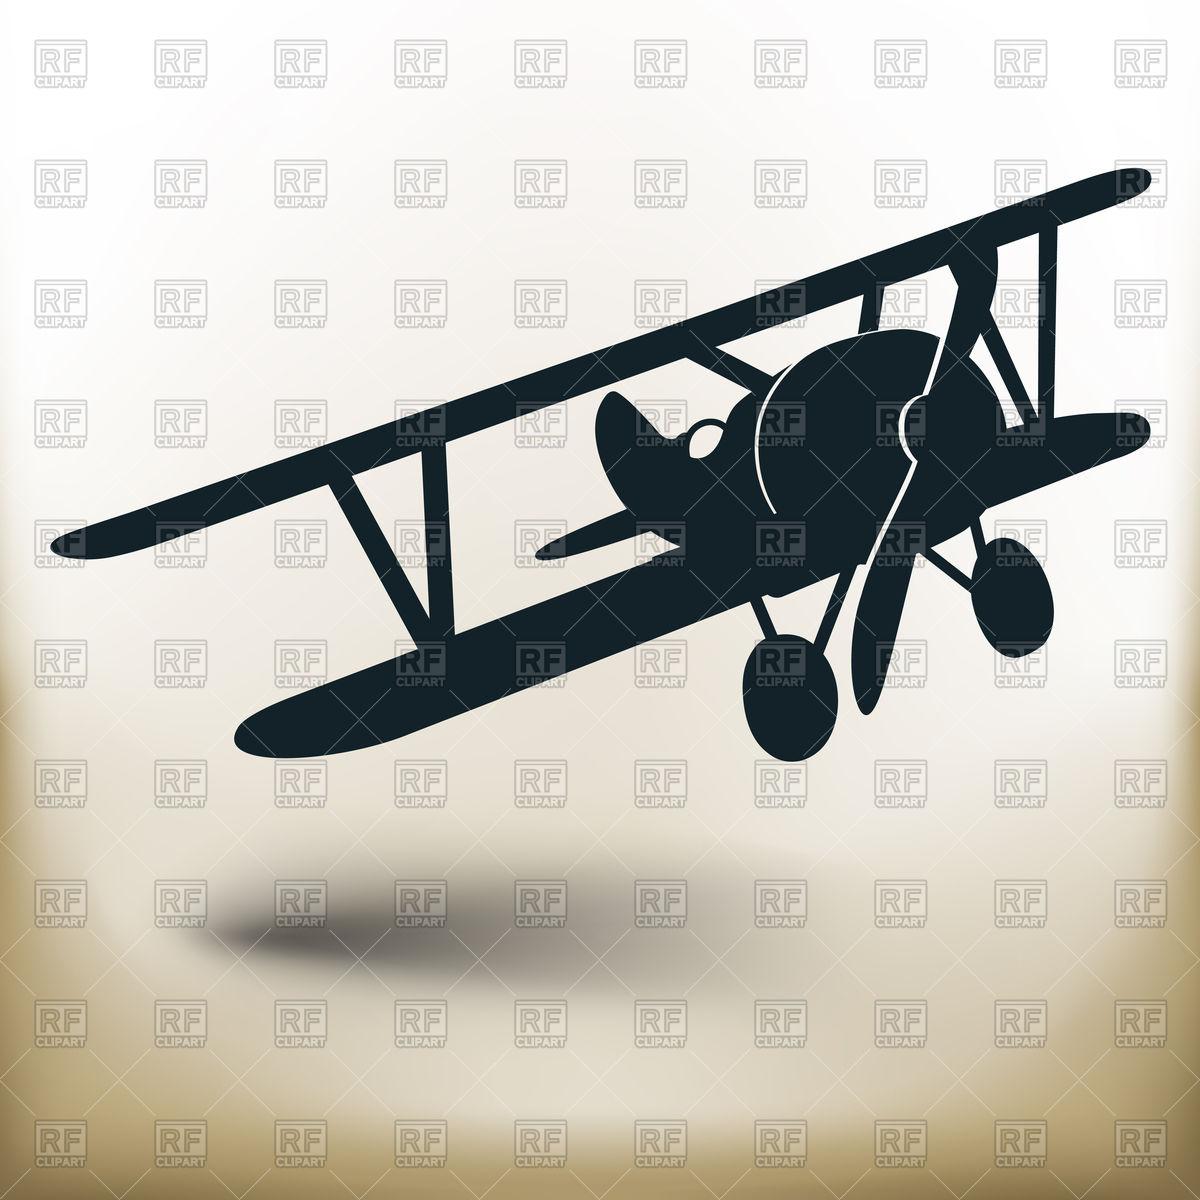 Biplane silhouette.